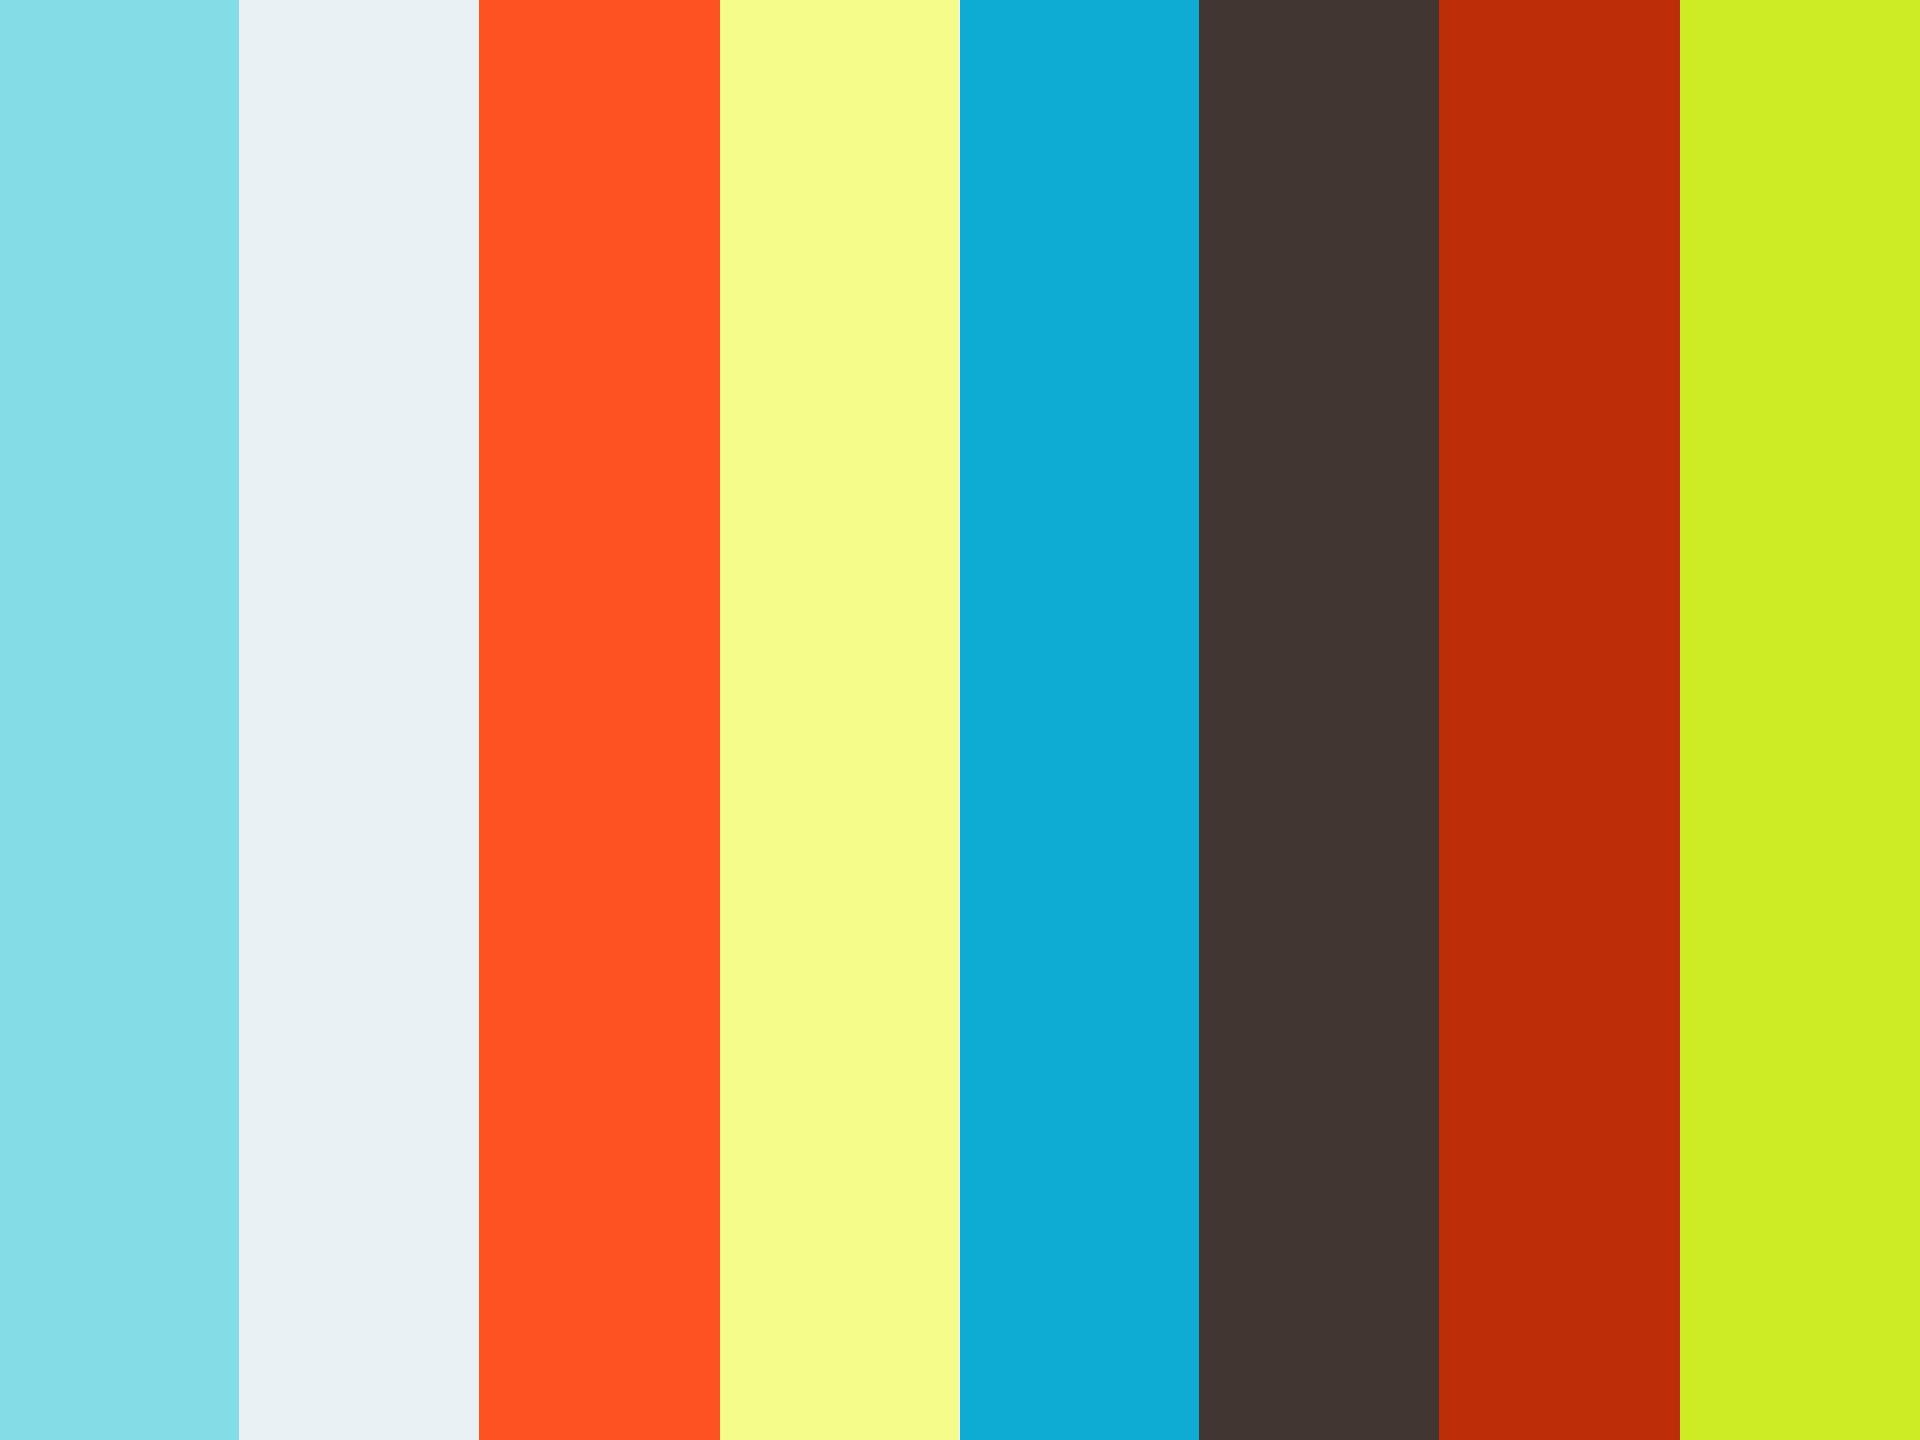 AUDI A5 - BLACK - 2017